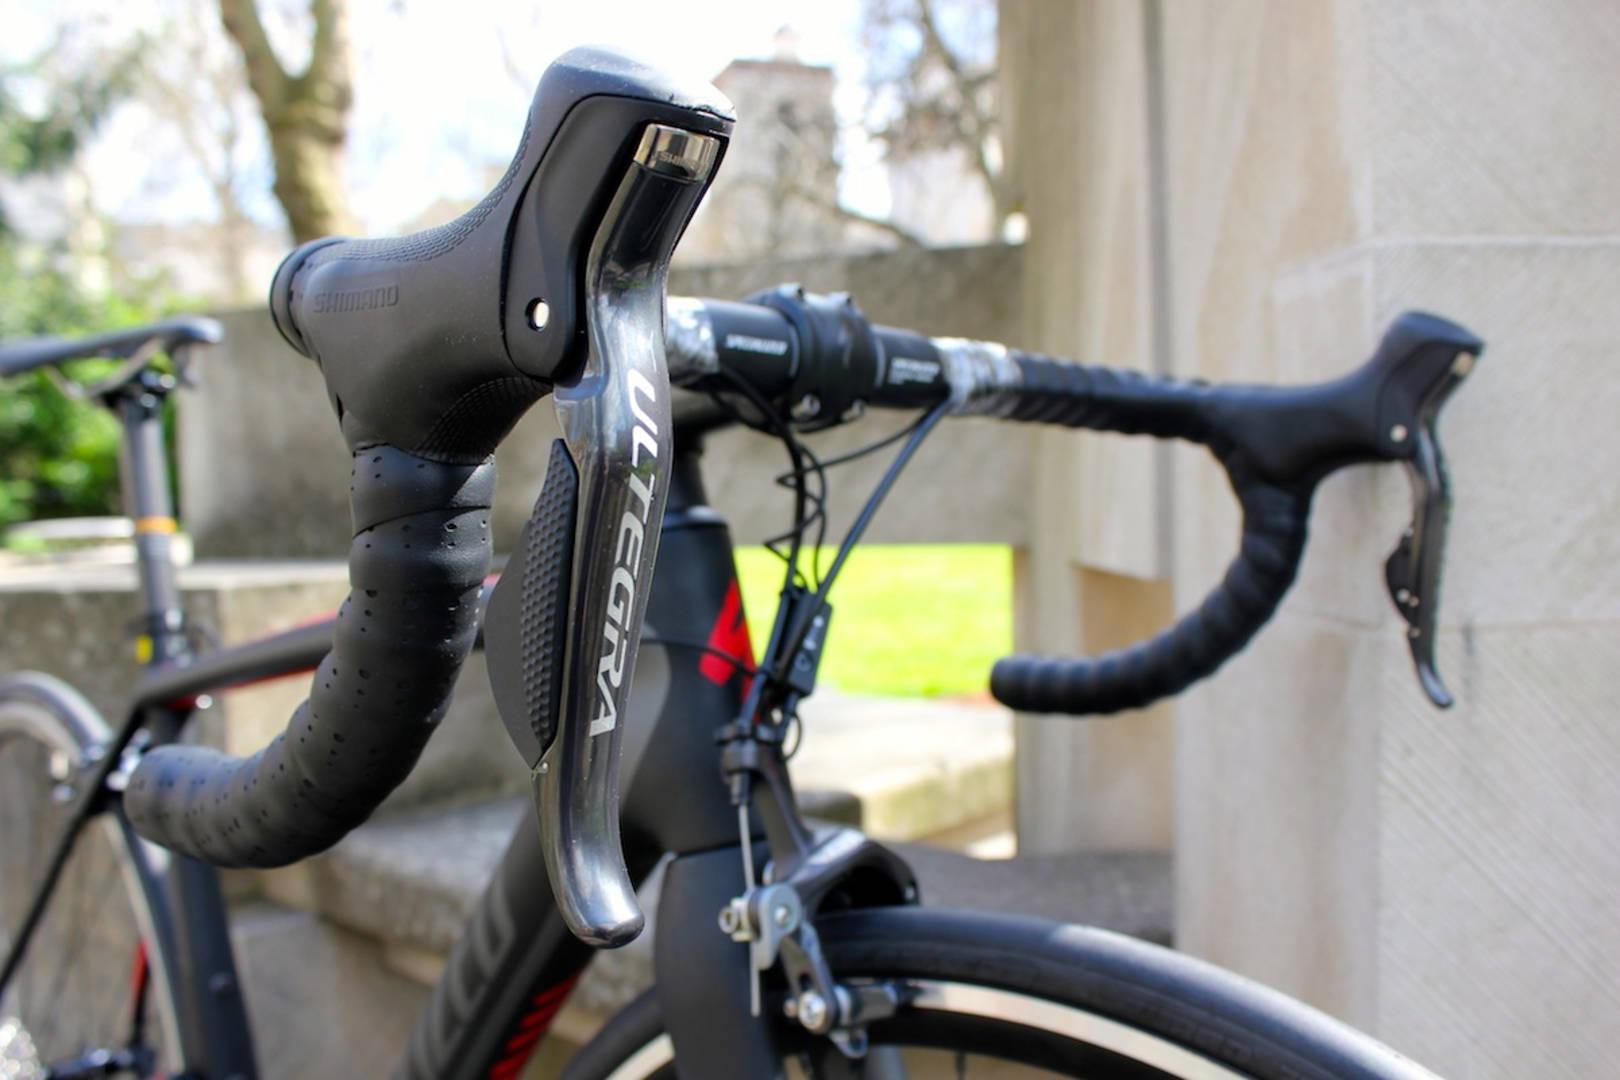 shimano di2 road bike (1)